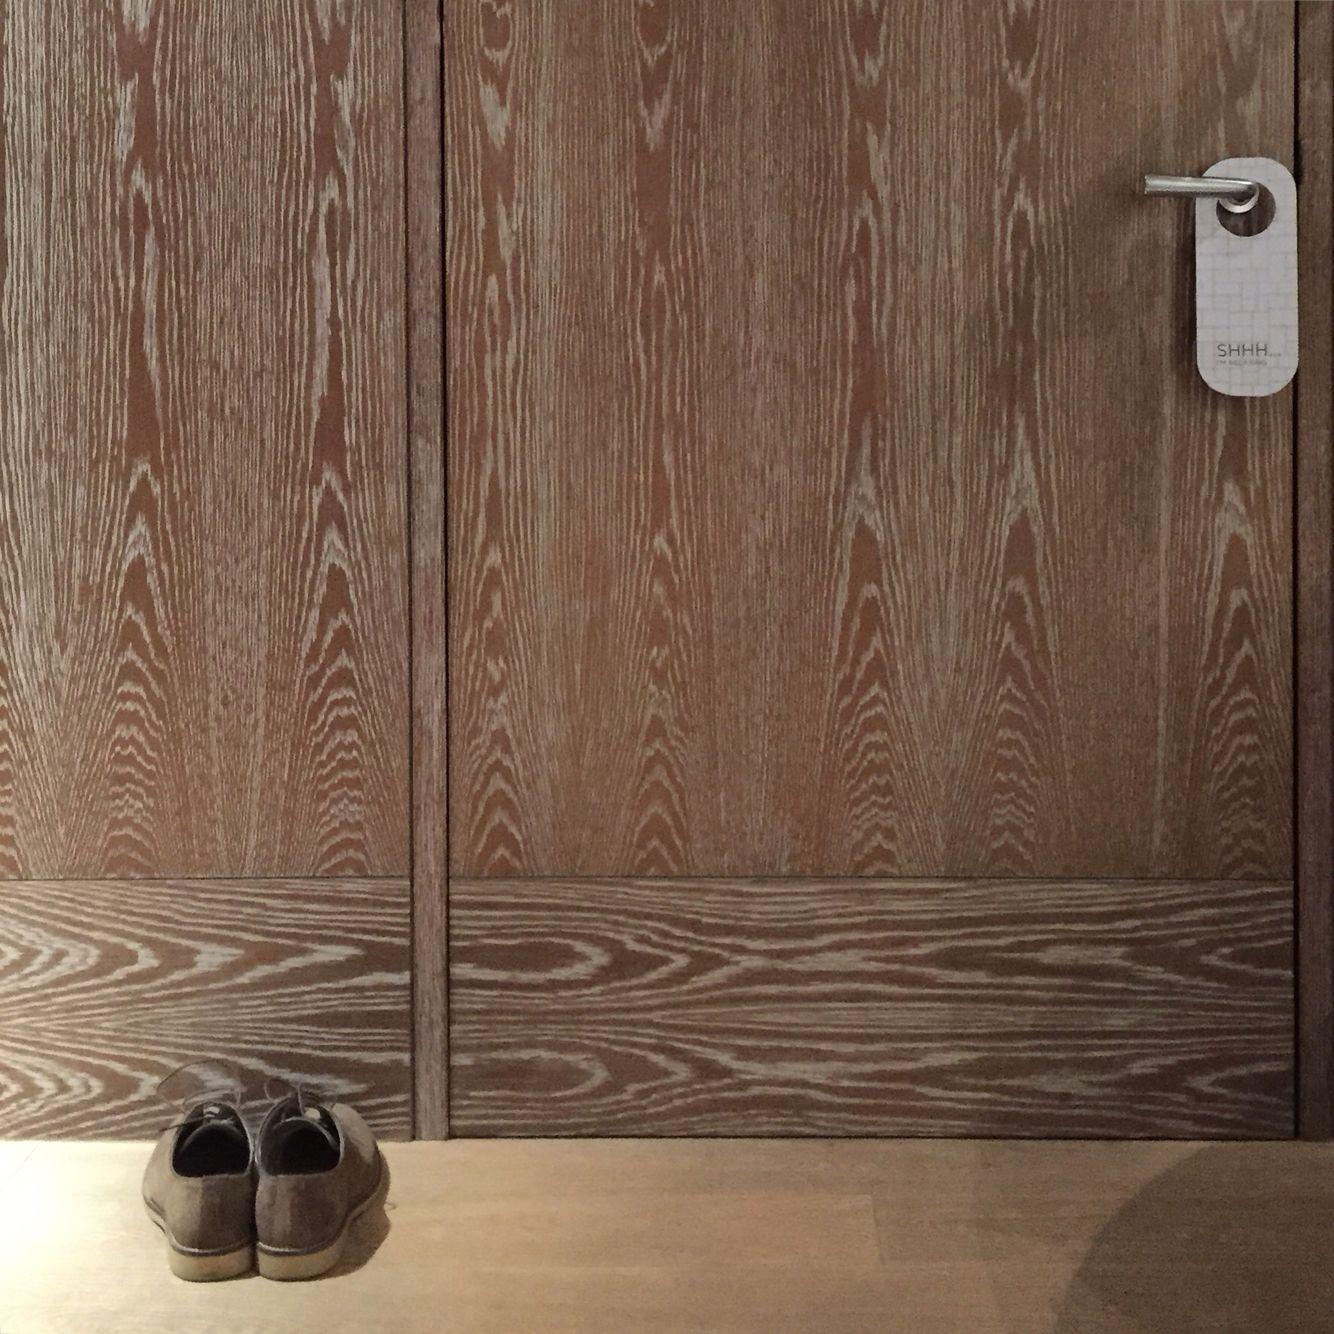 Home Design Ideas Hong Kong: The Jervois Hong Kong By Christian Liagre